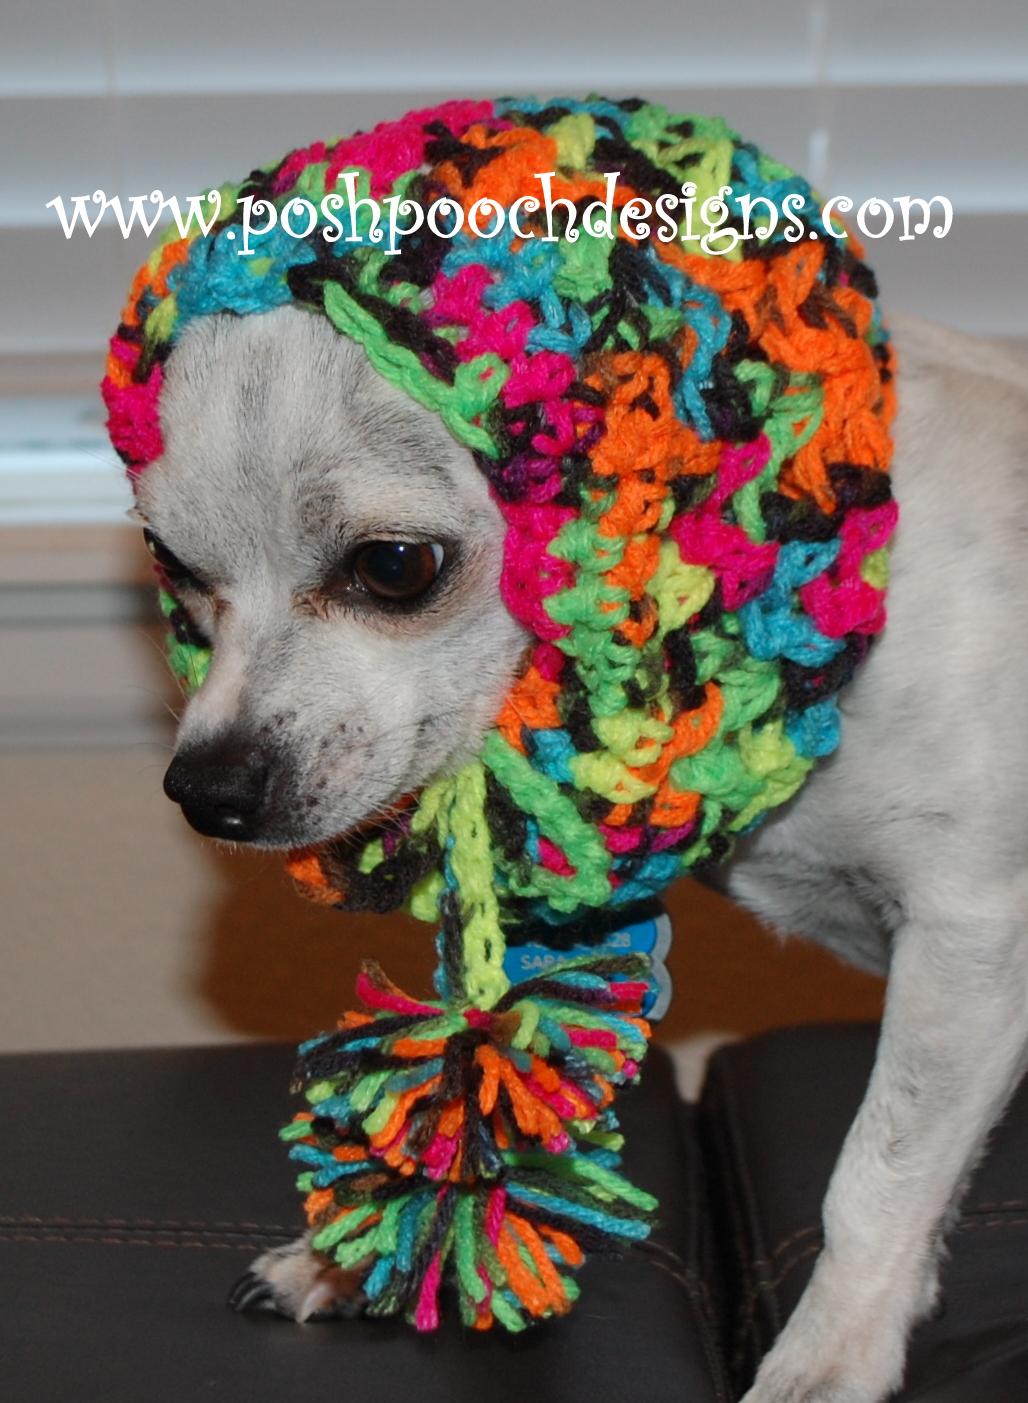 Posh Pooch Designs Dog Clothes: Black Light Cowl Crochet ...